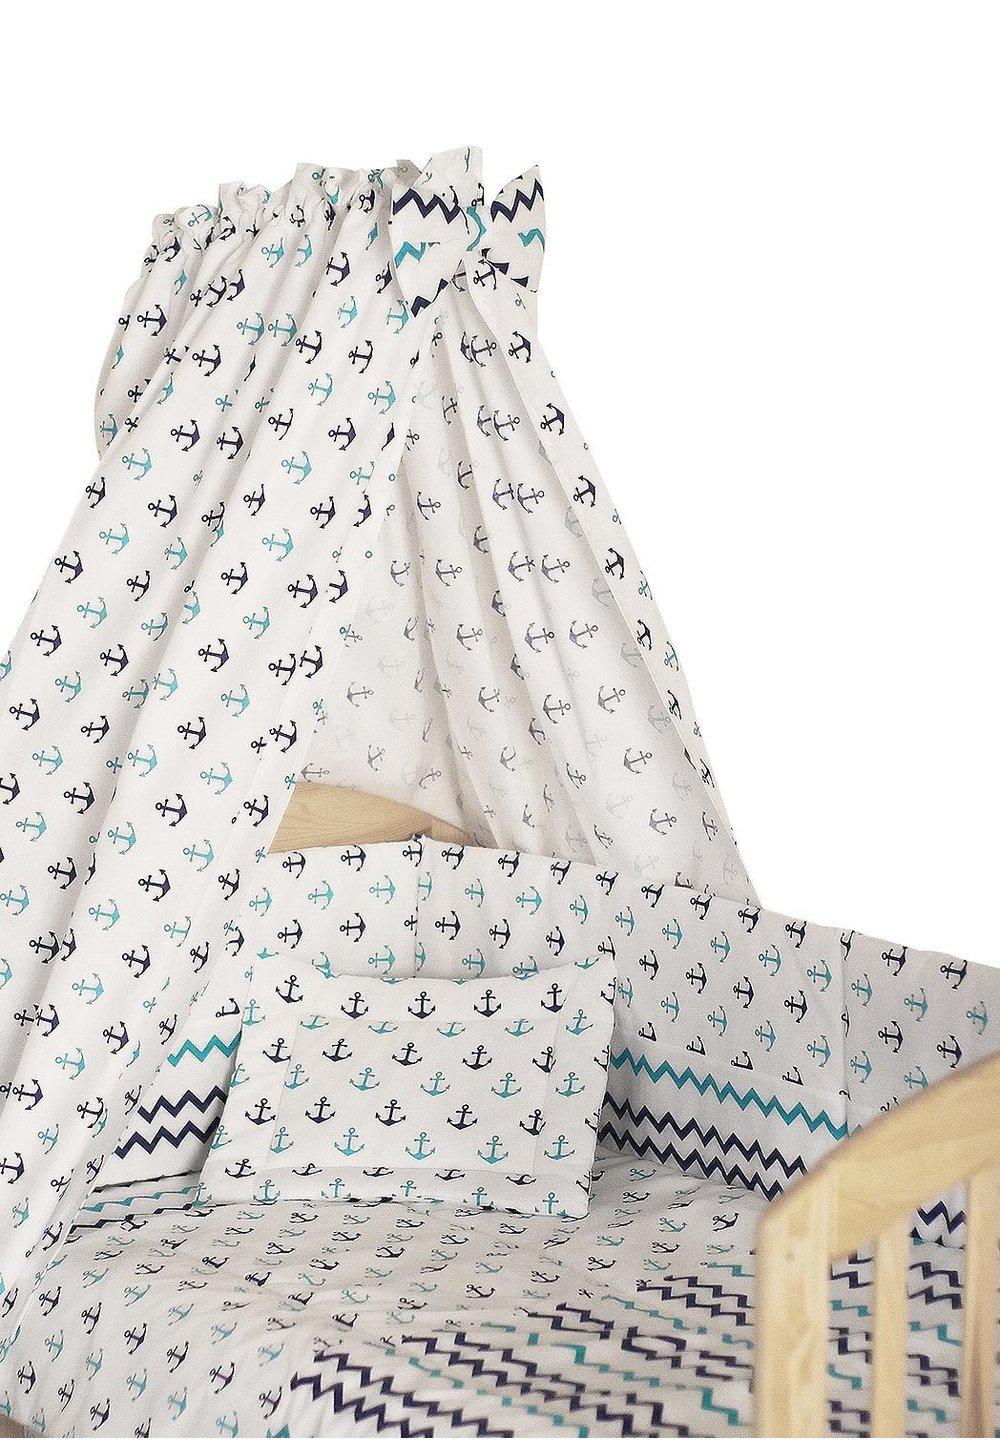 Lenjerie cu baldachin, 6 piese, ancore, 120x60 cm imagine